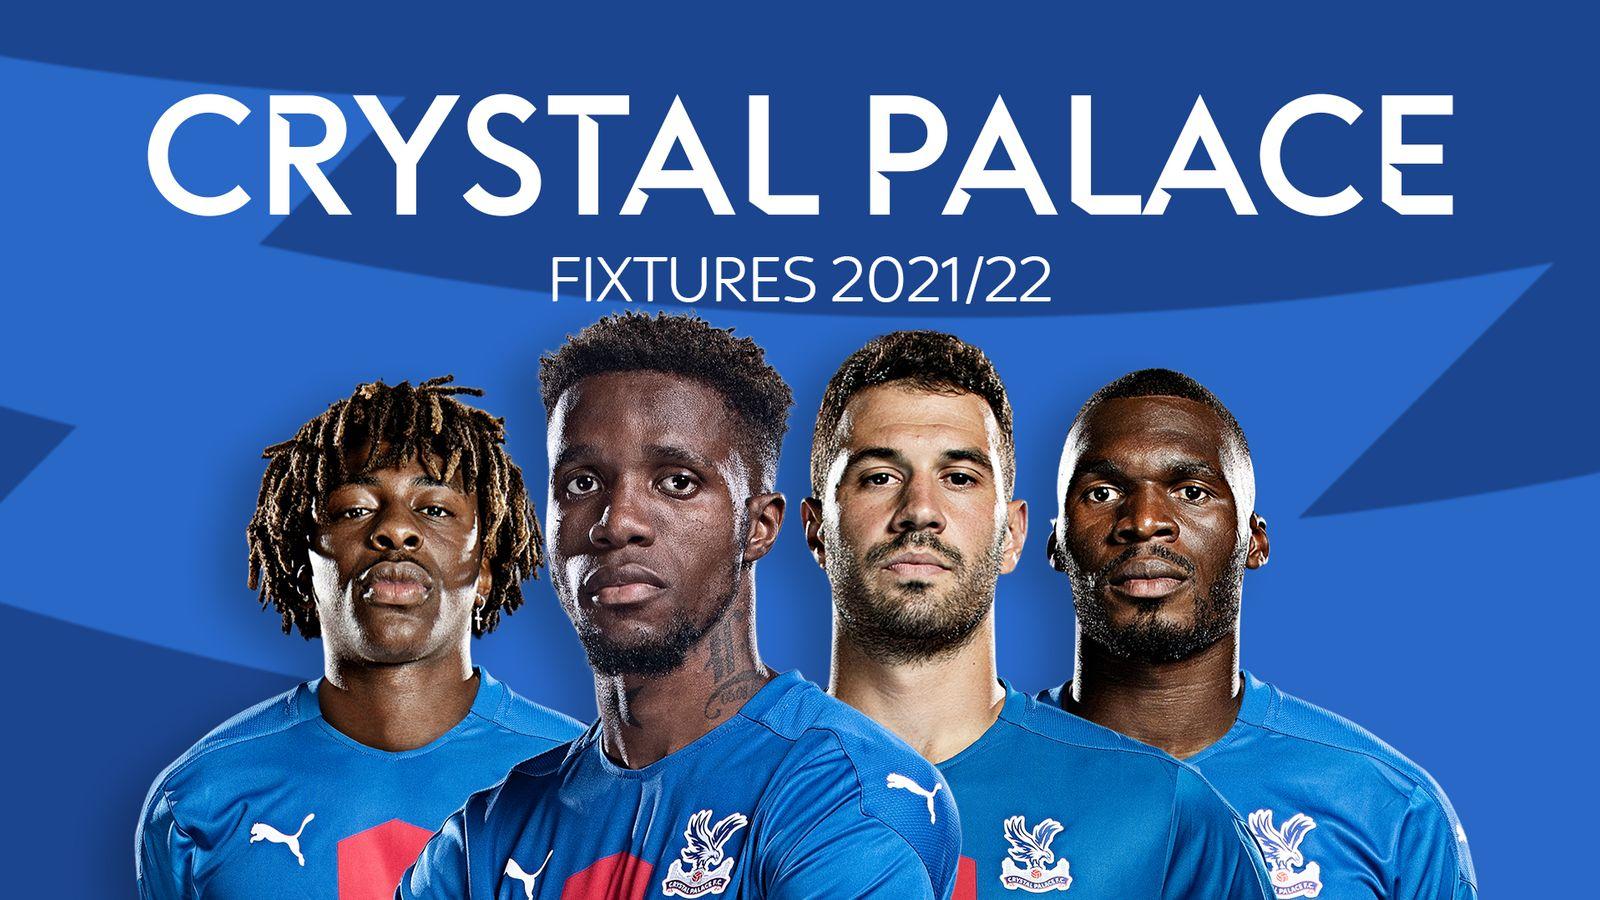 skysports-crystal-palace-fixtures_5415953.jpg?20210615152616